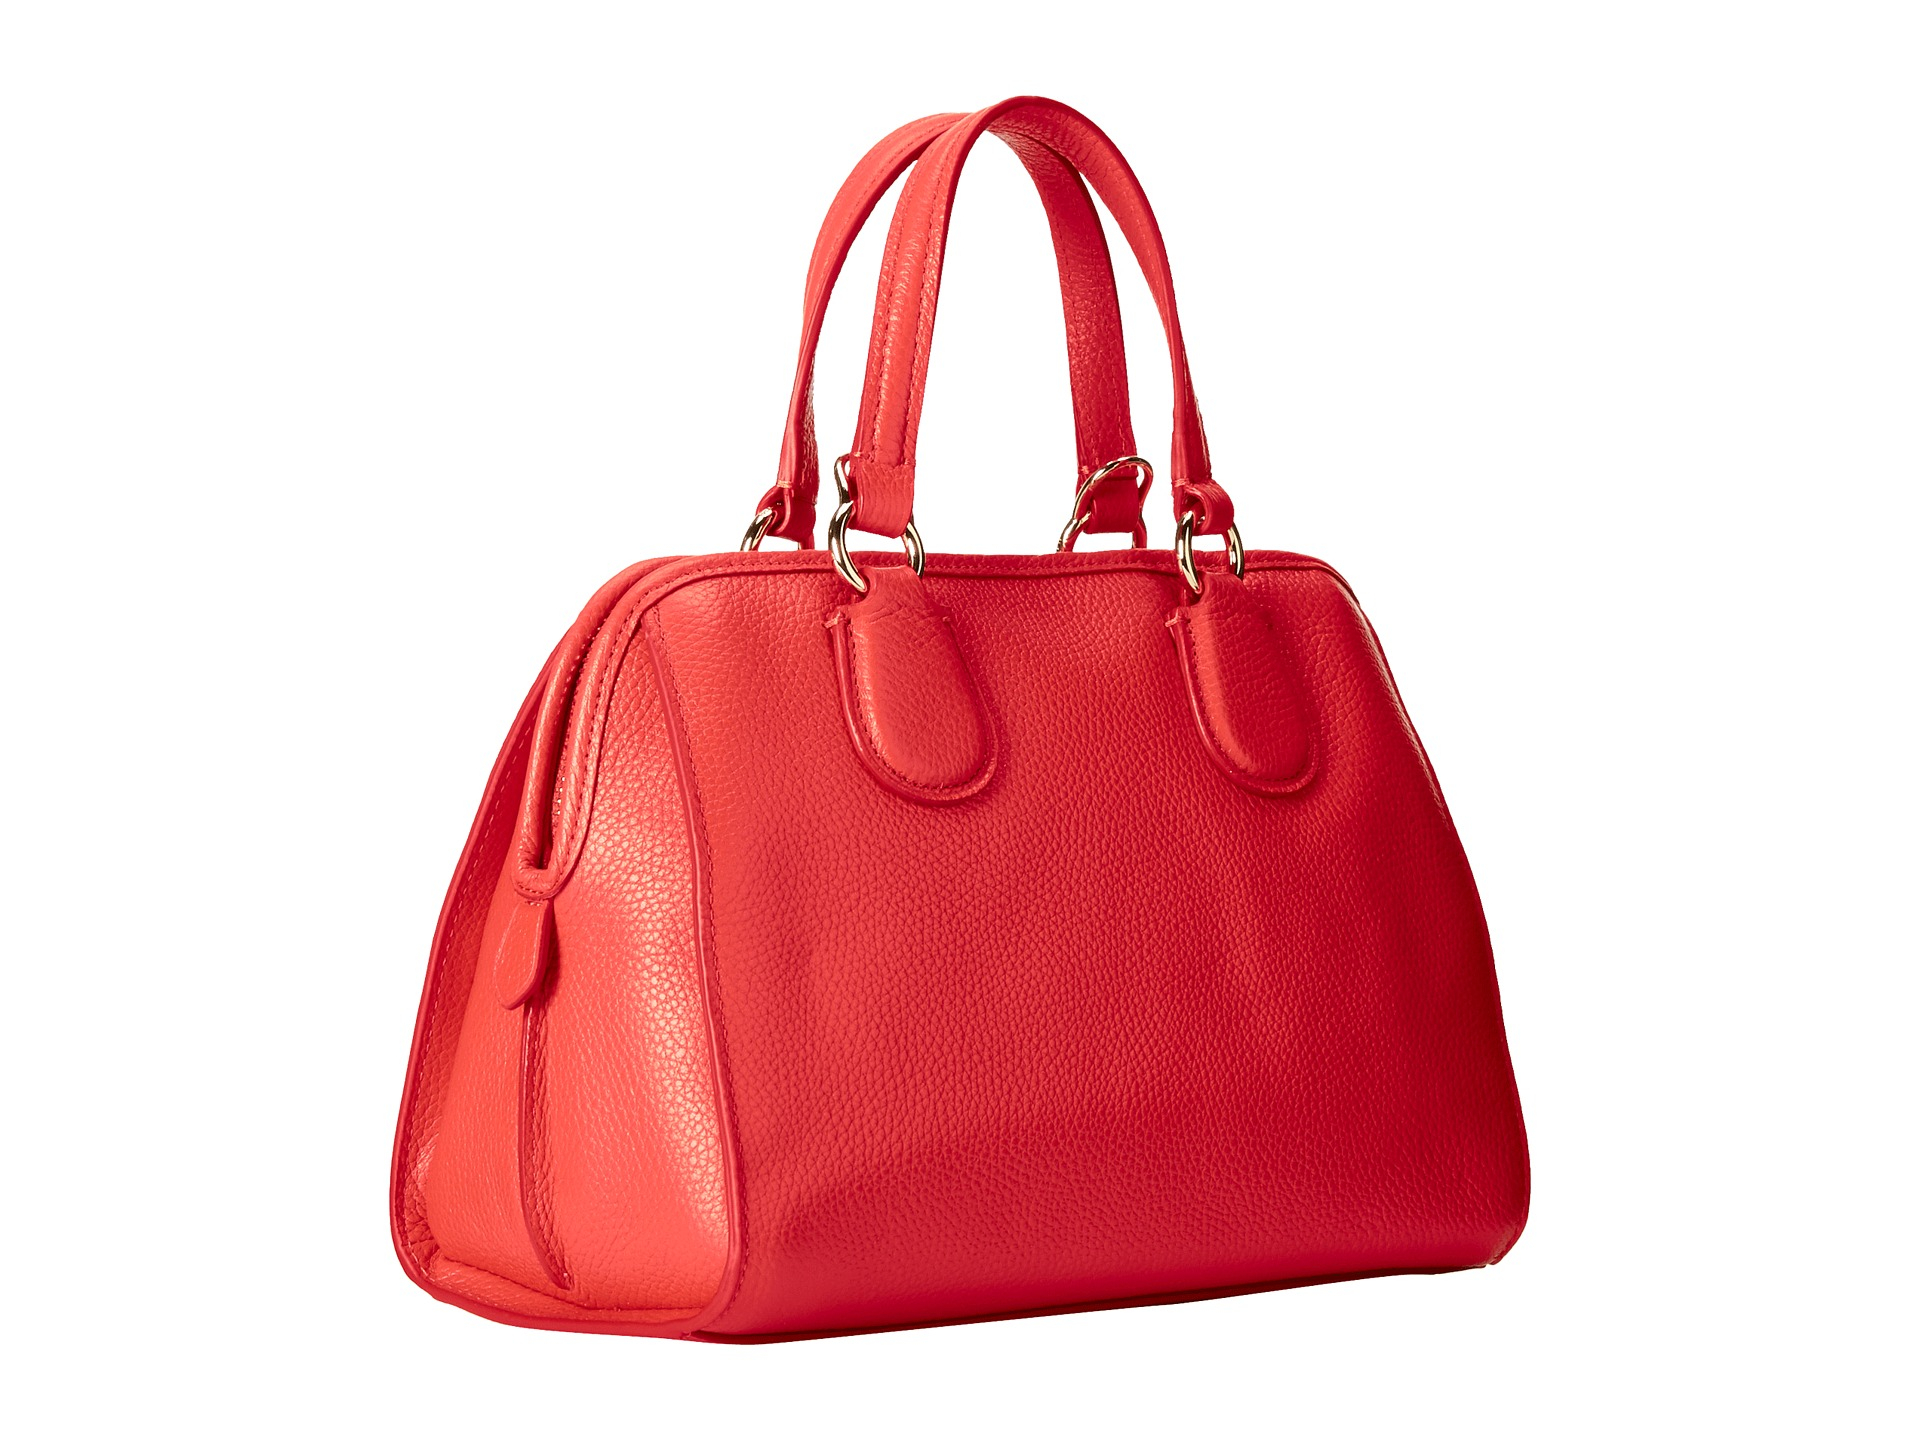 feb62be01f Lyst - COACH Refined Grain Leather Mini Nolita Satchel in Red